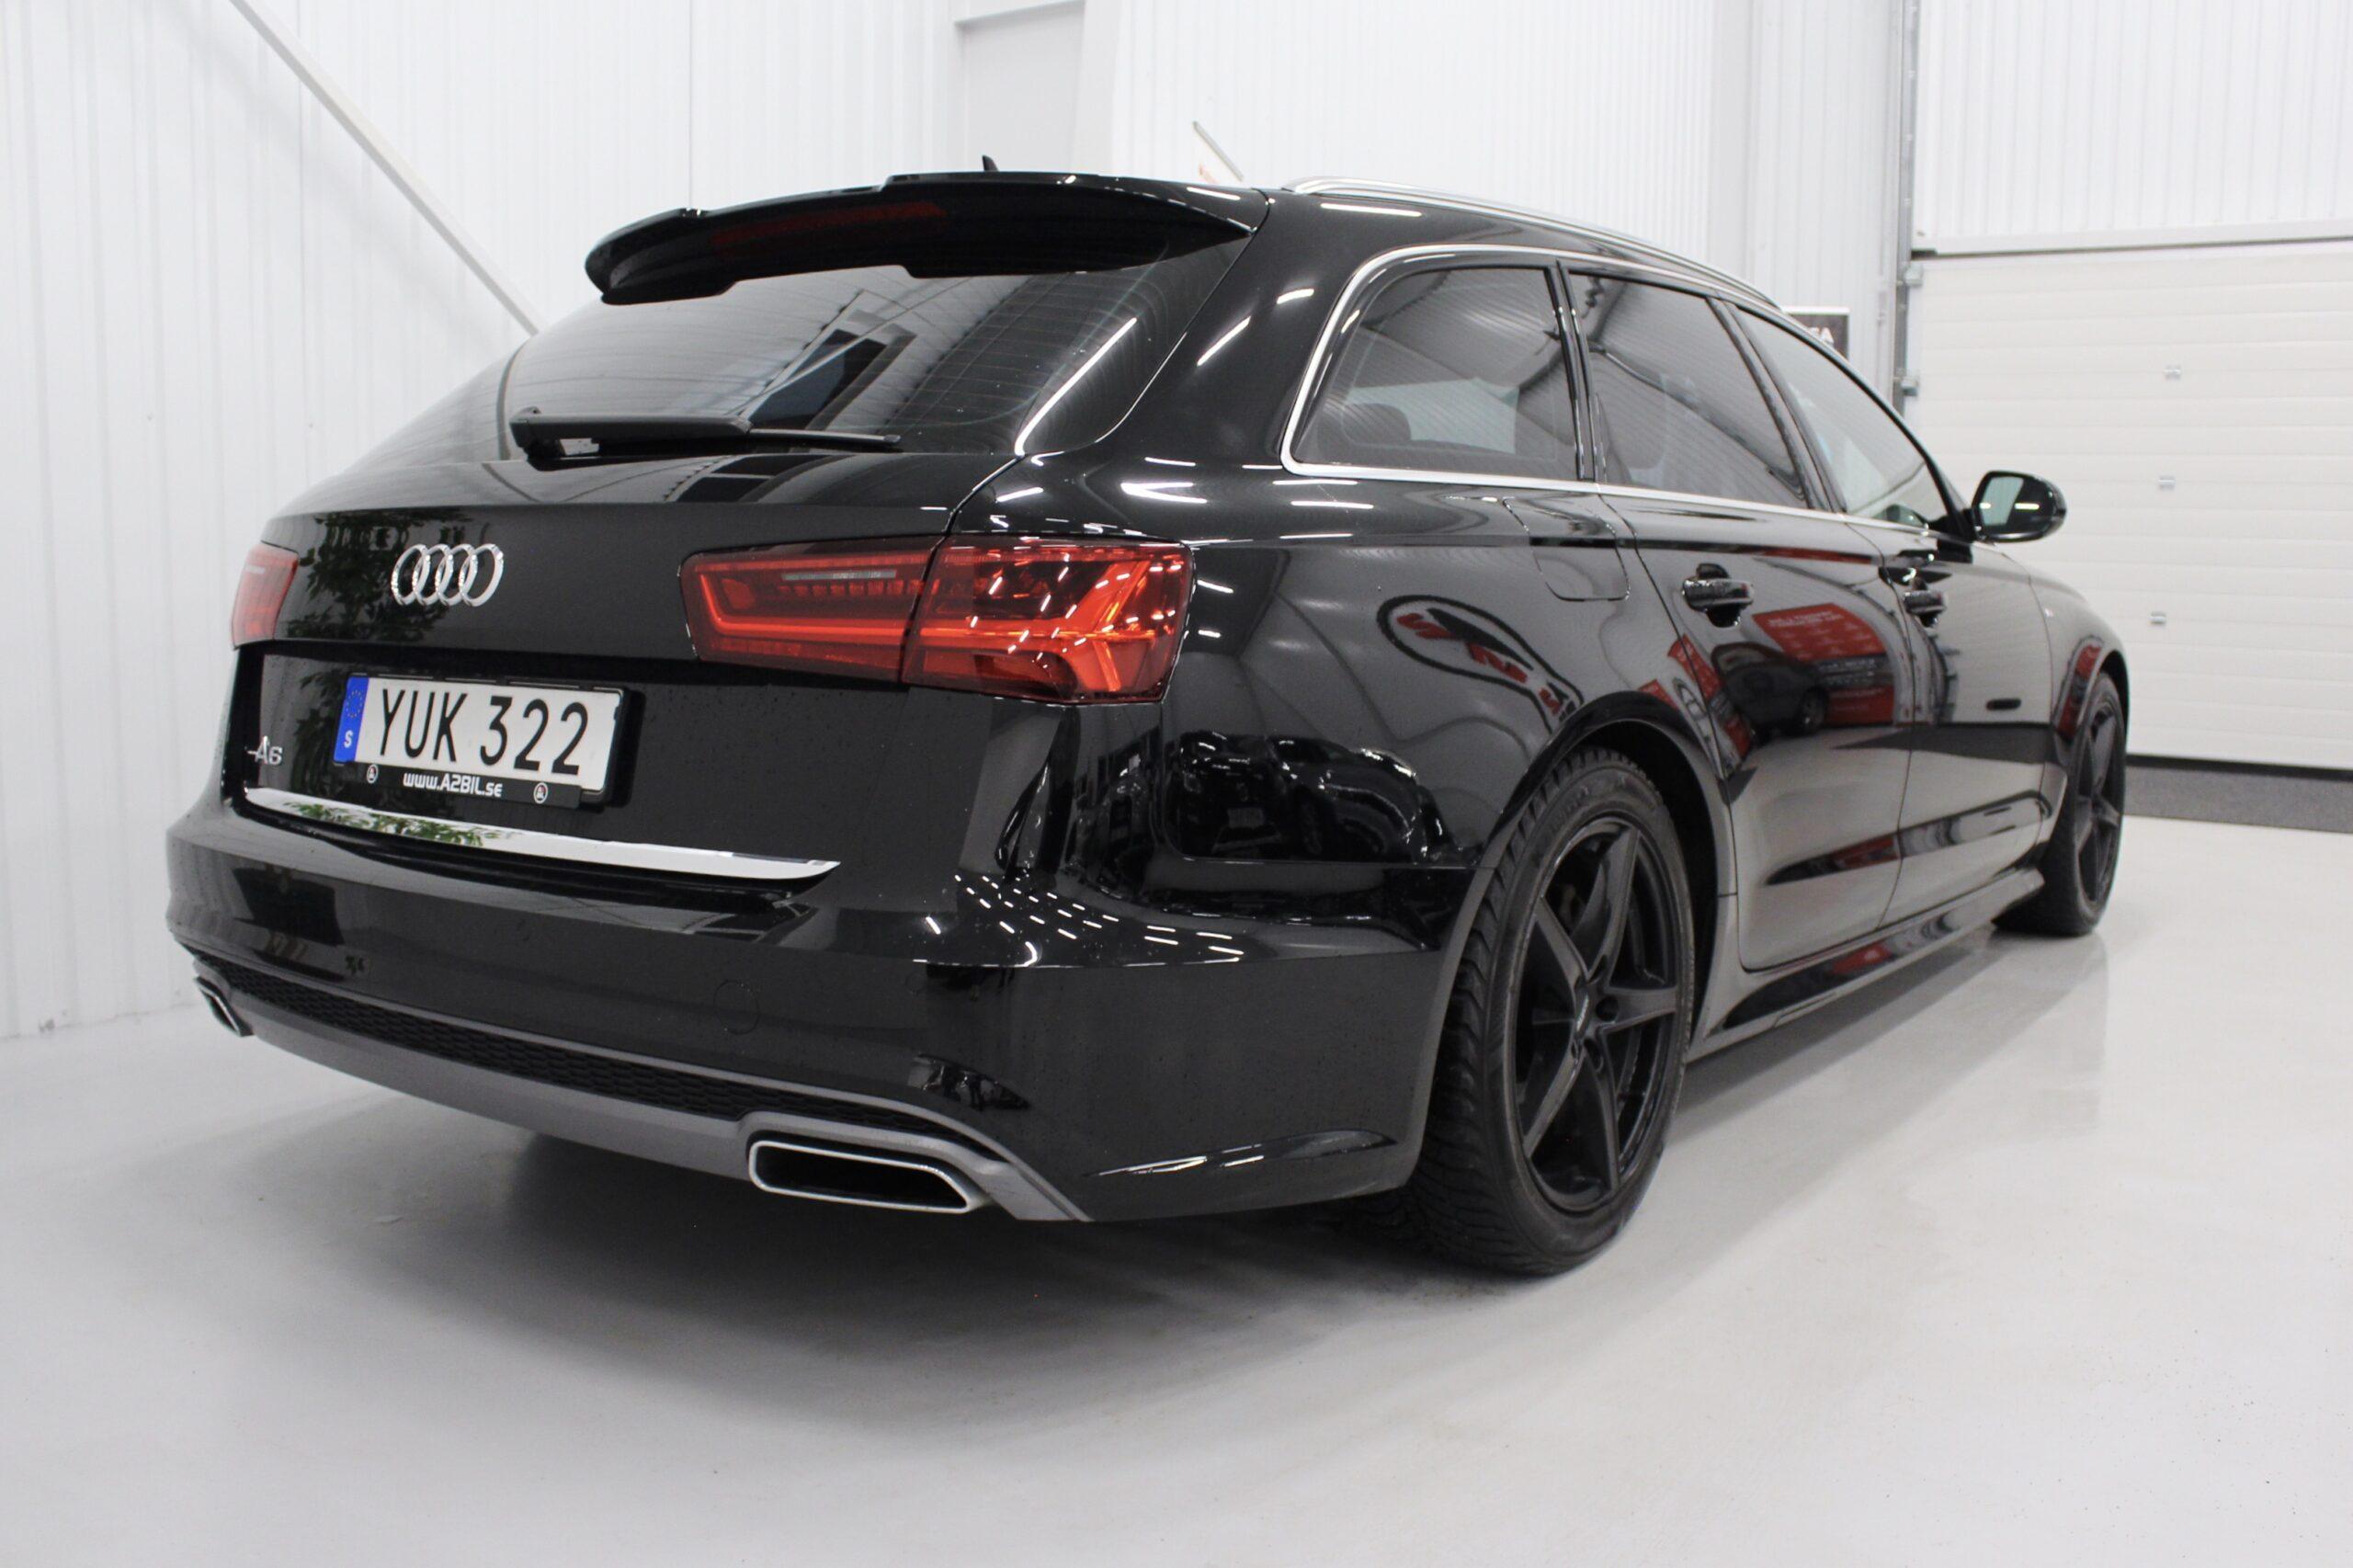 Audi A6 Avant 2.0 TDI ultra S Tronic Ambition S-Line Euro 6